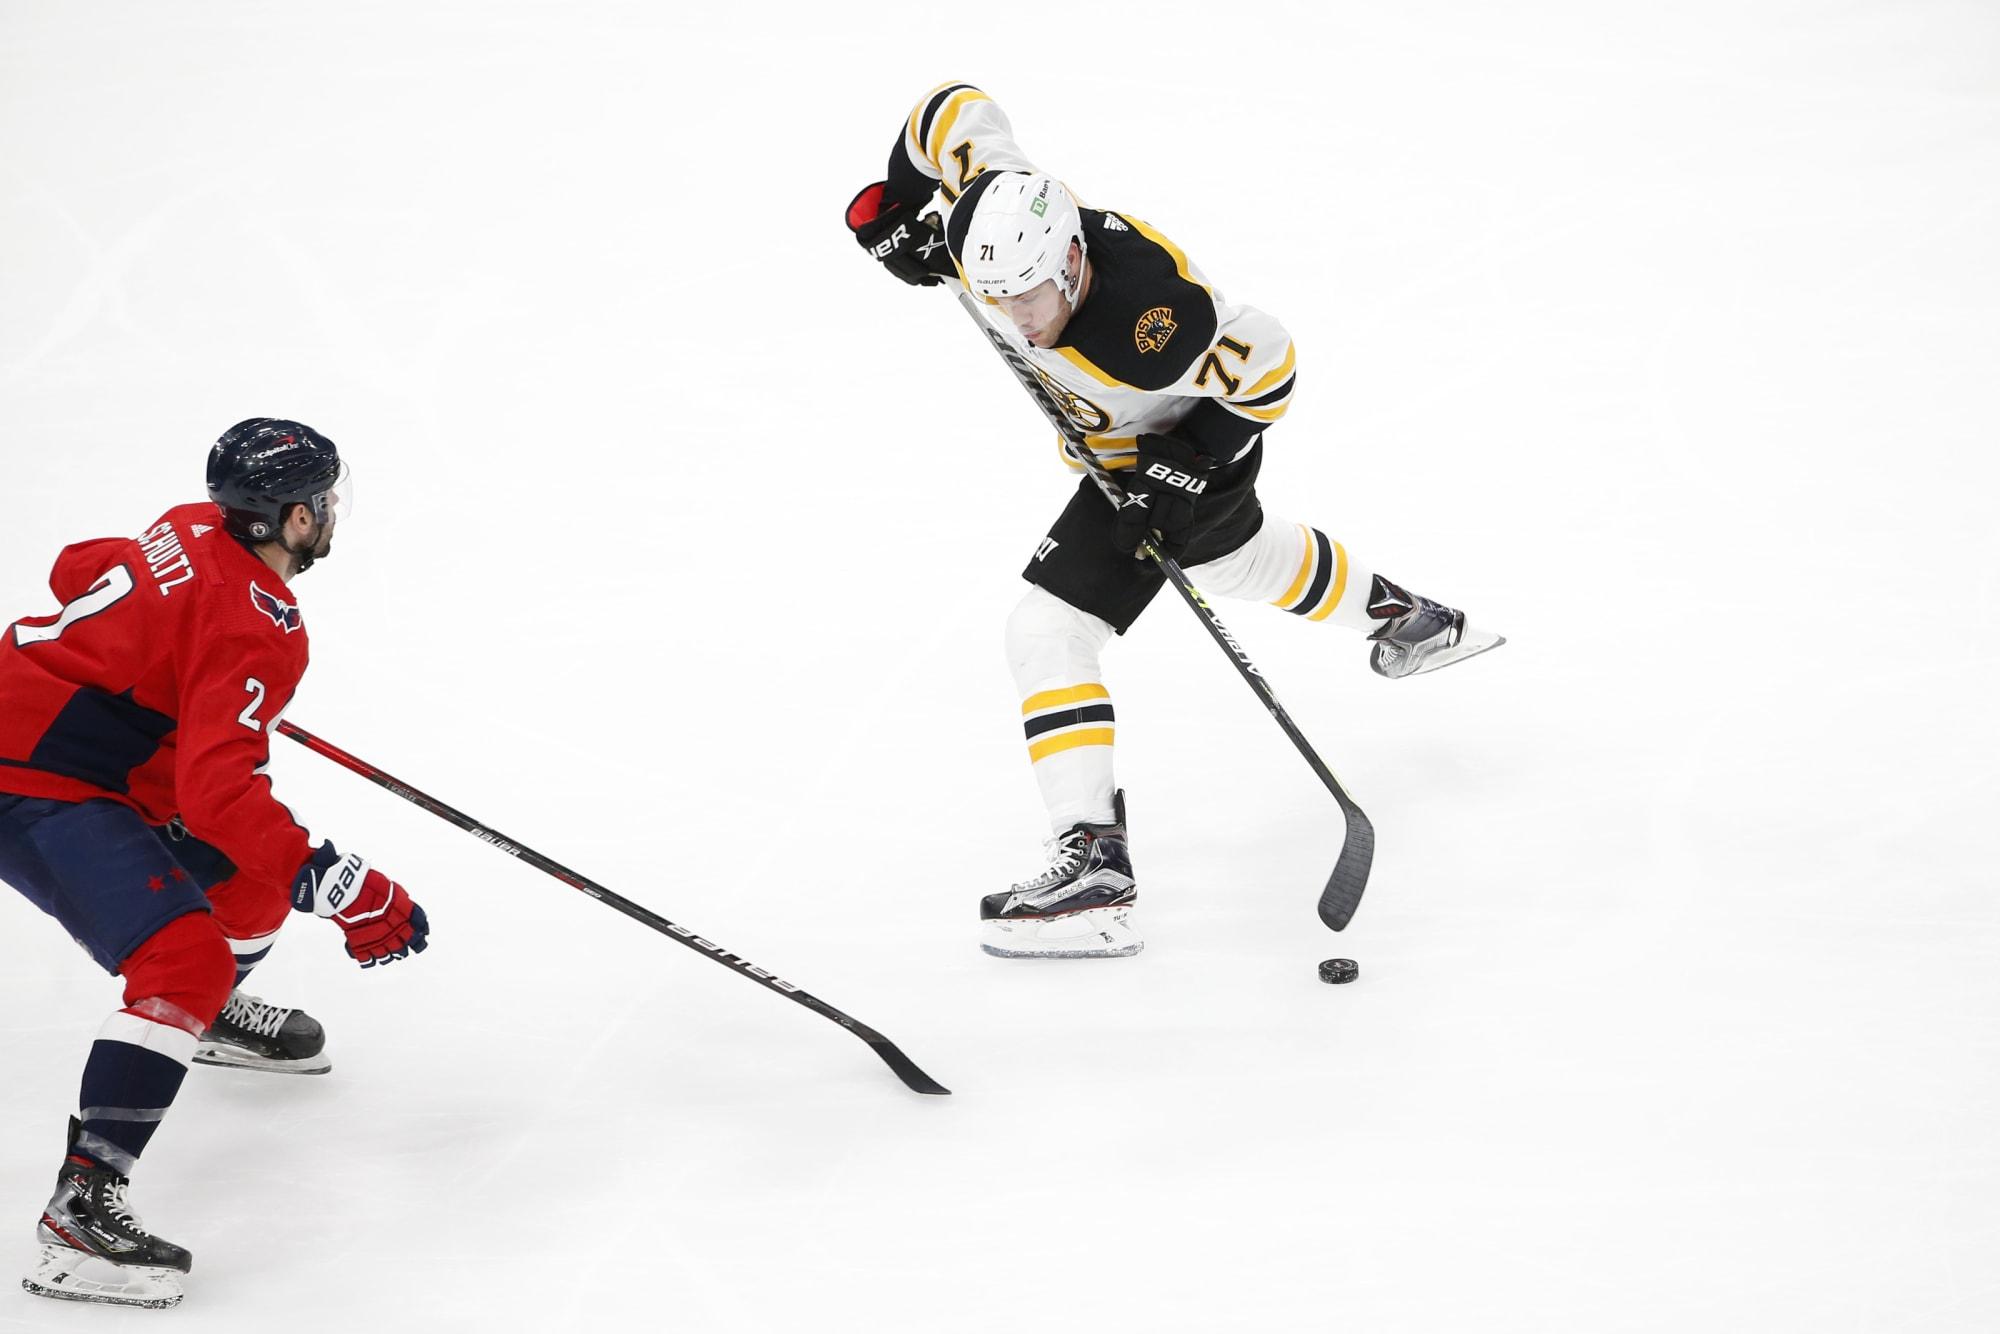 Edmonton Oilers: Did anyone win the Hall-Larsson trade?